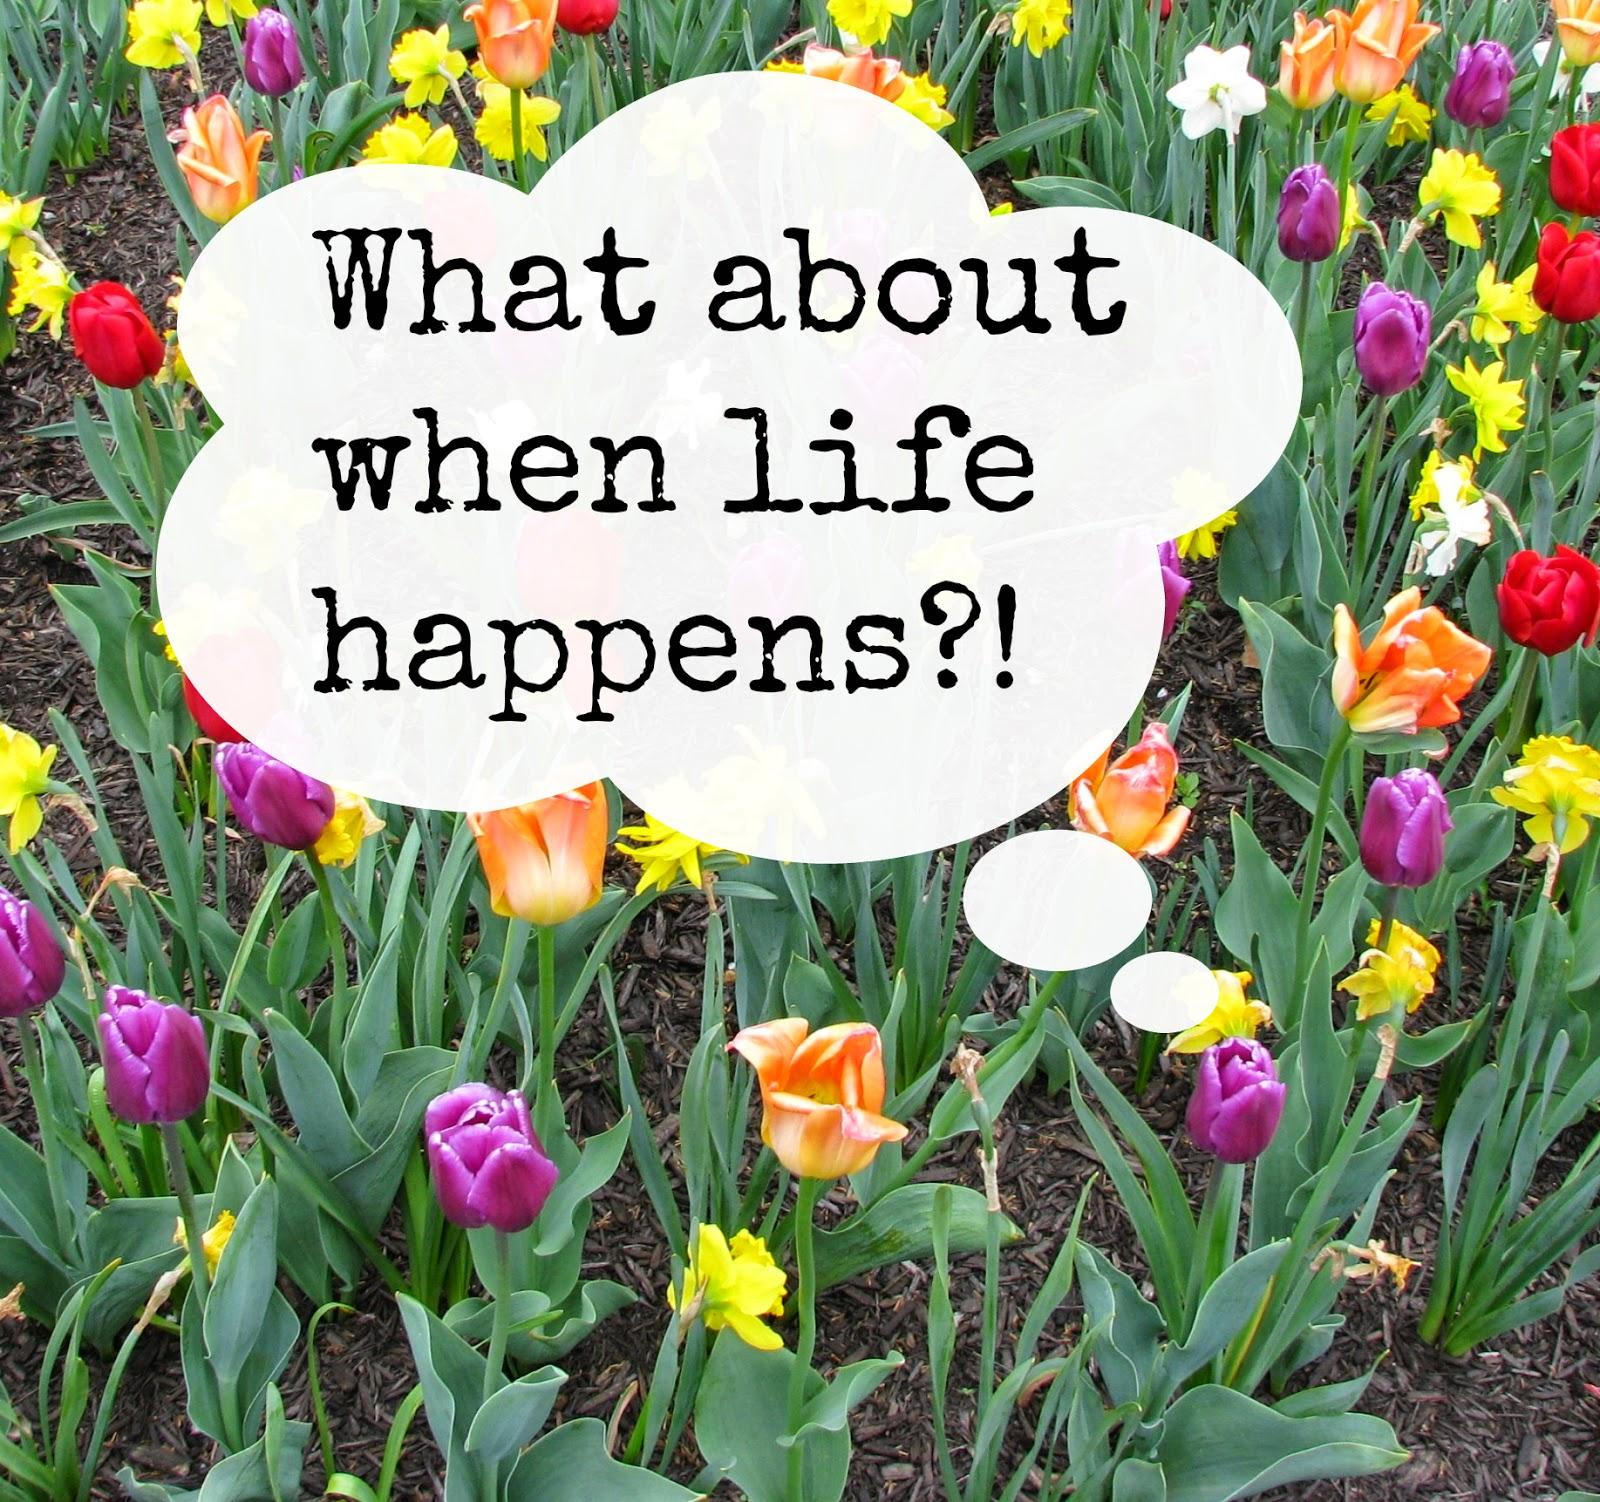 homeschooling through crisis, homeschooling, life happens